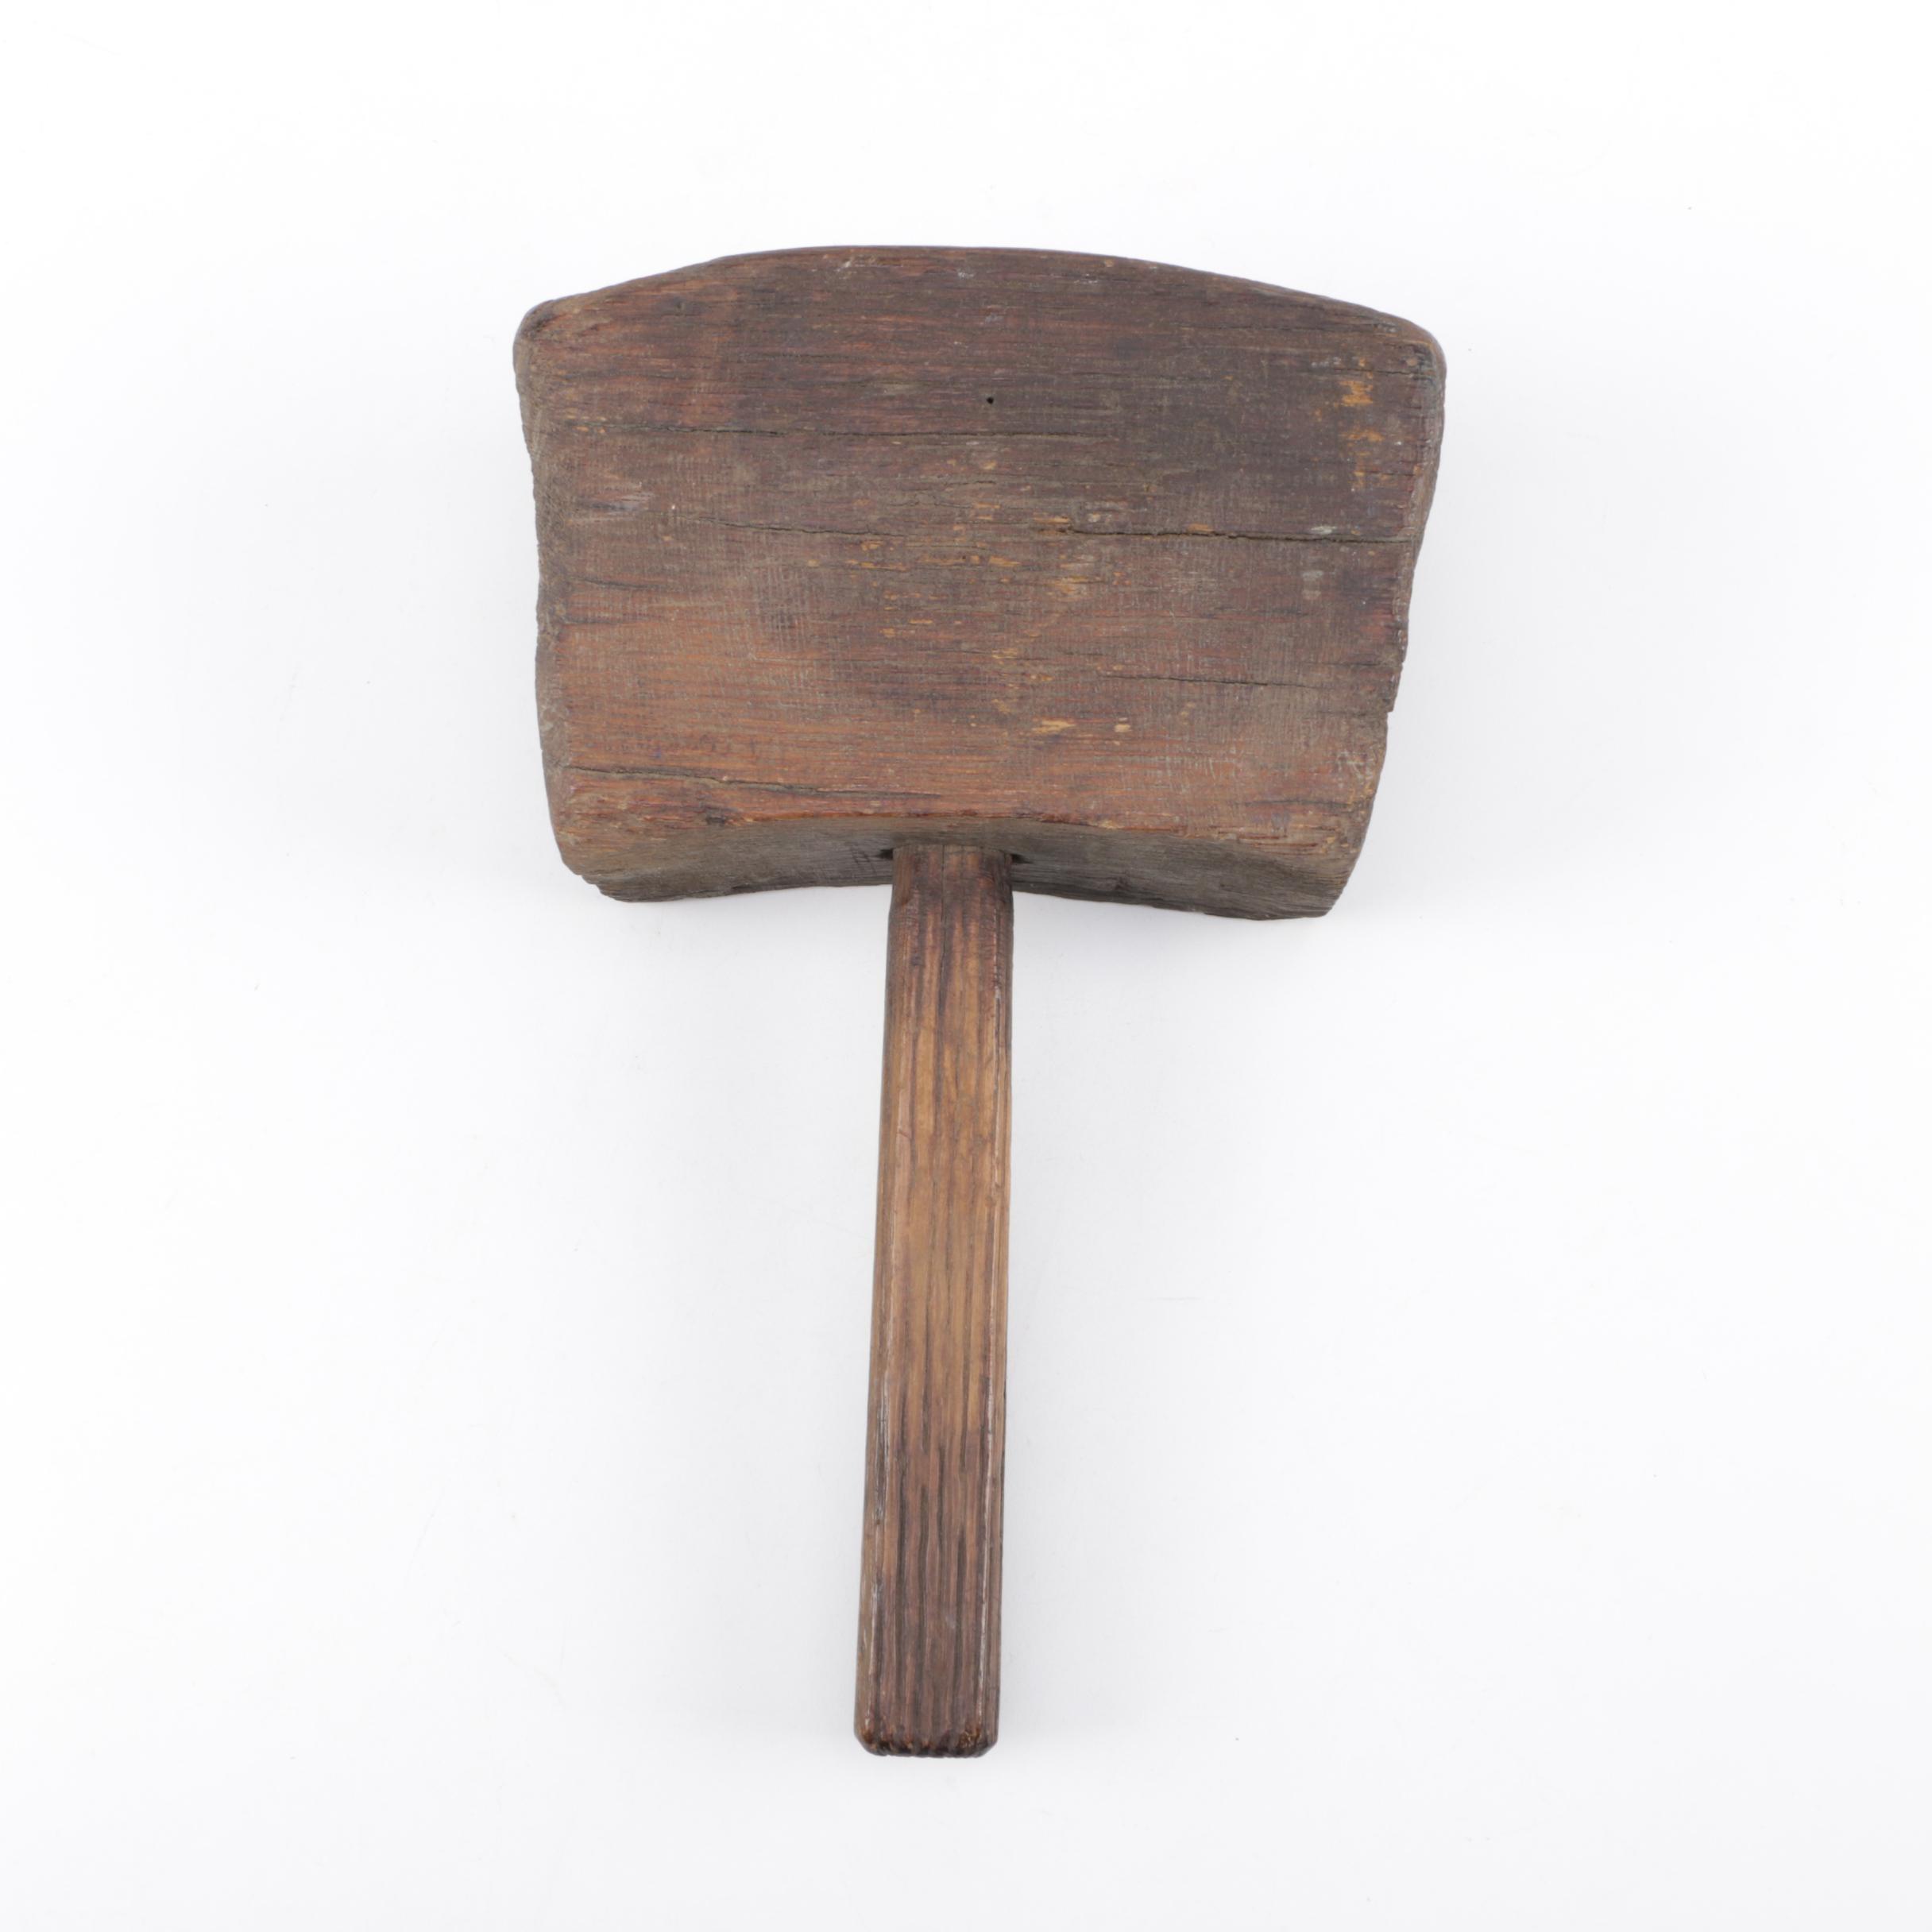 Antique Wooden Mallet